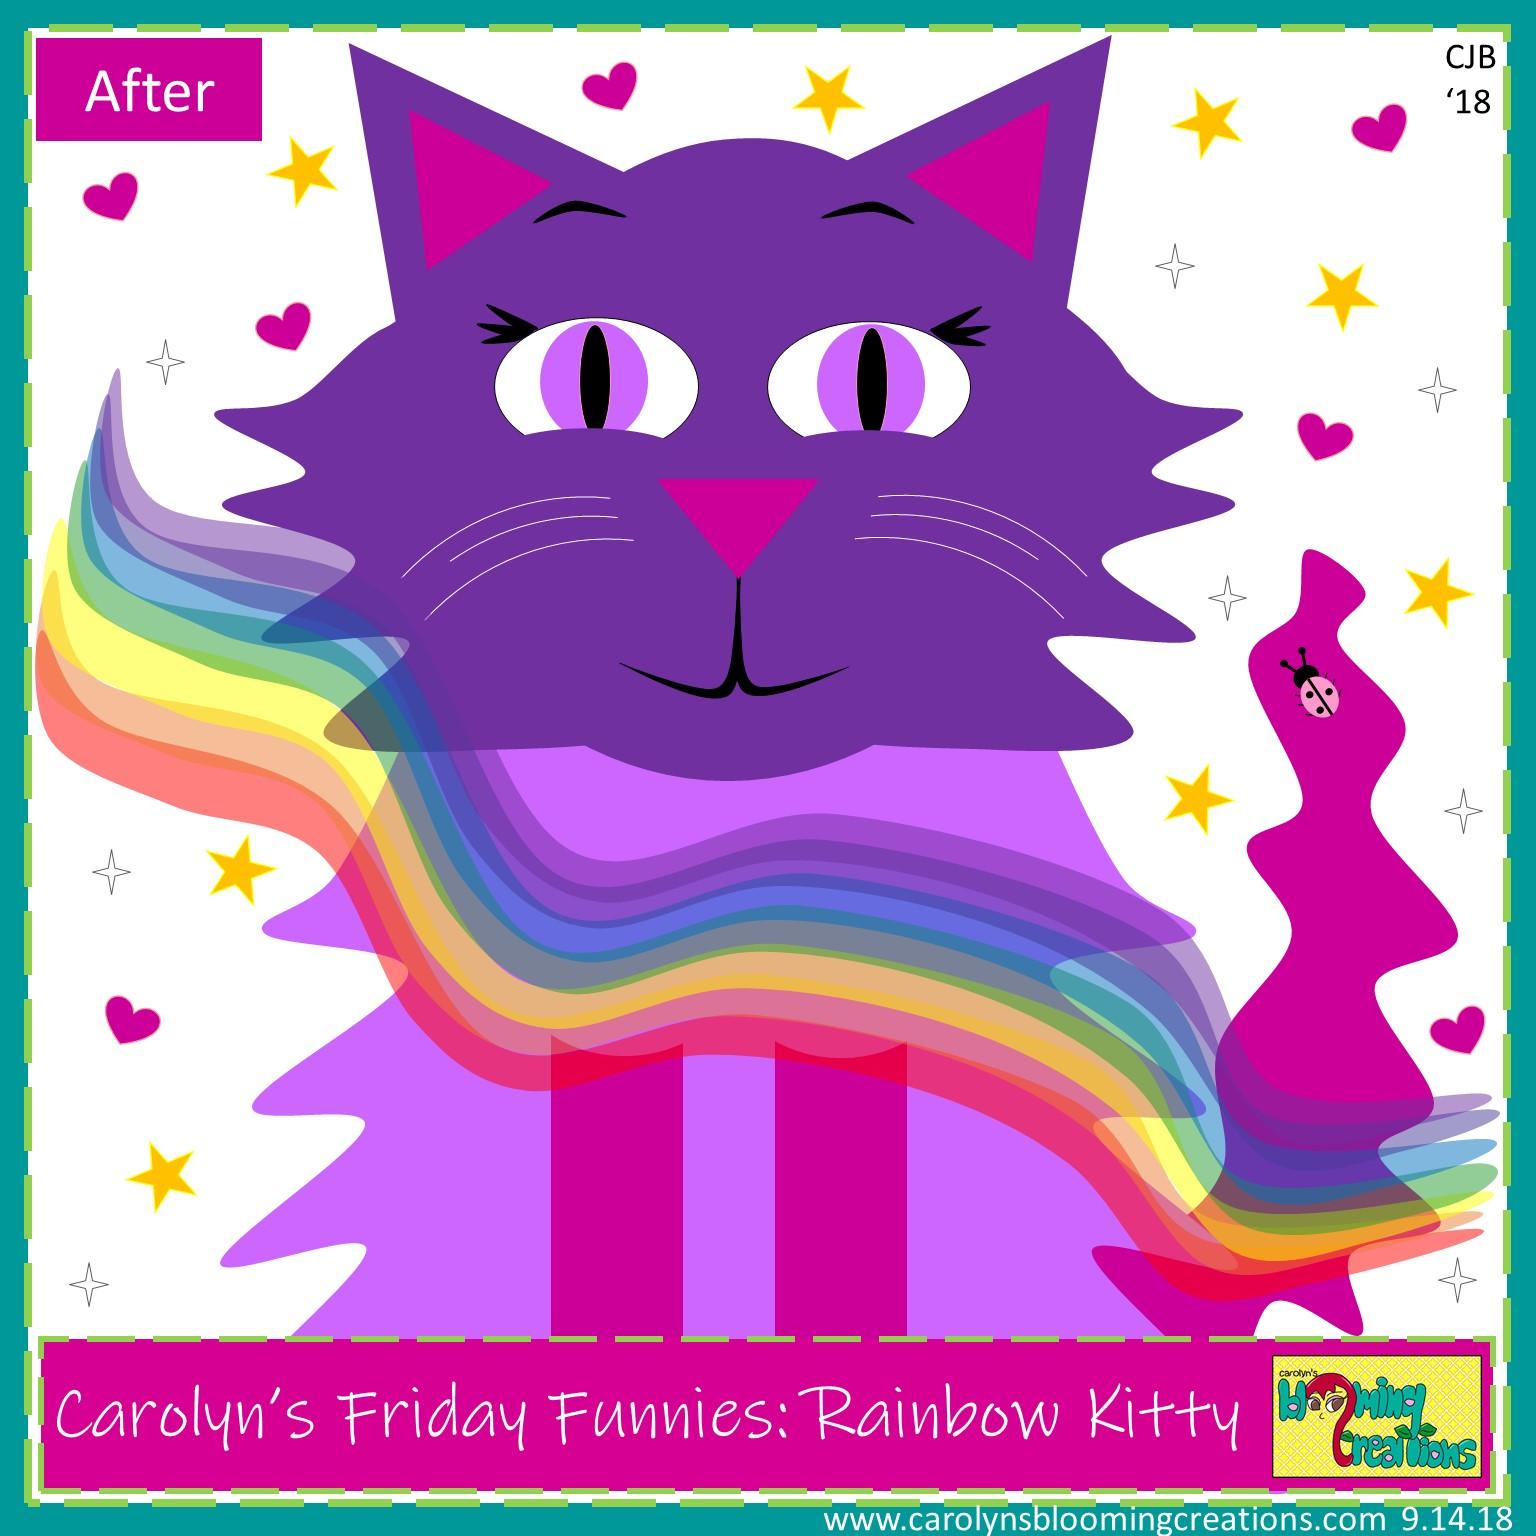 Carolyn Braden Rainbow Kitty After.jpg